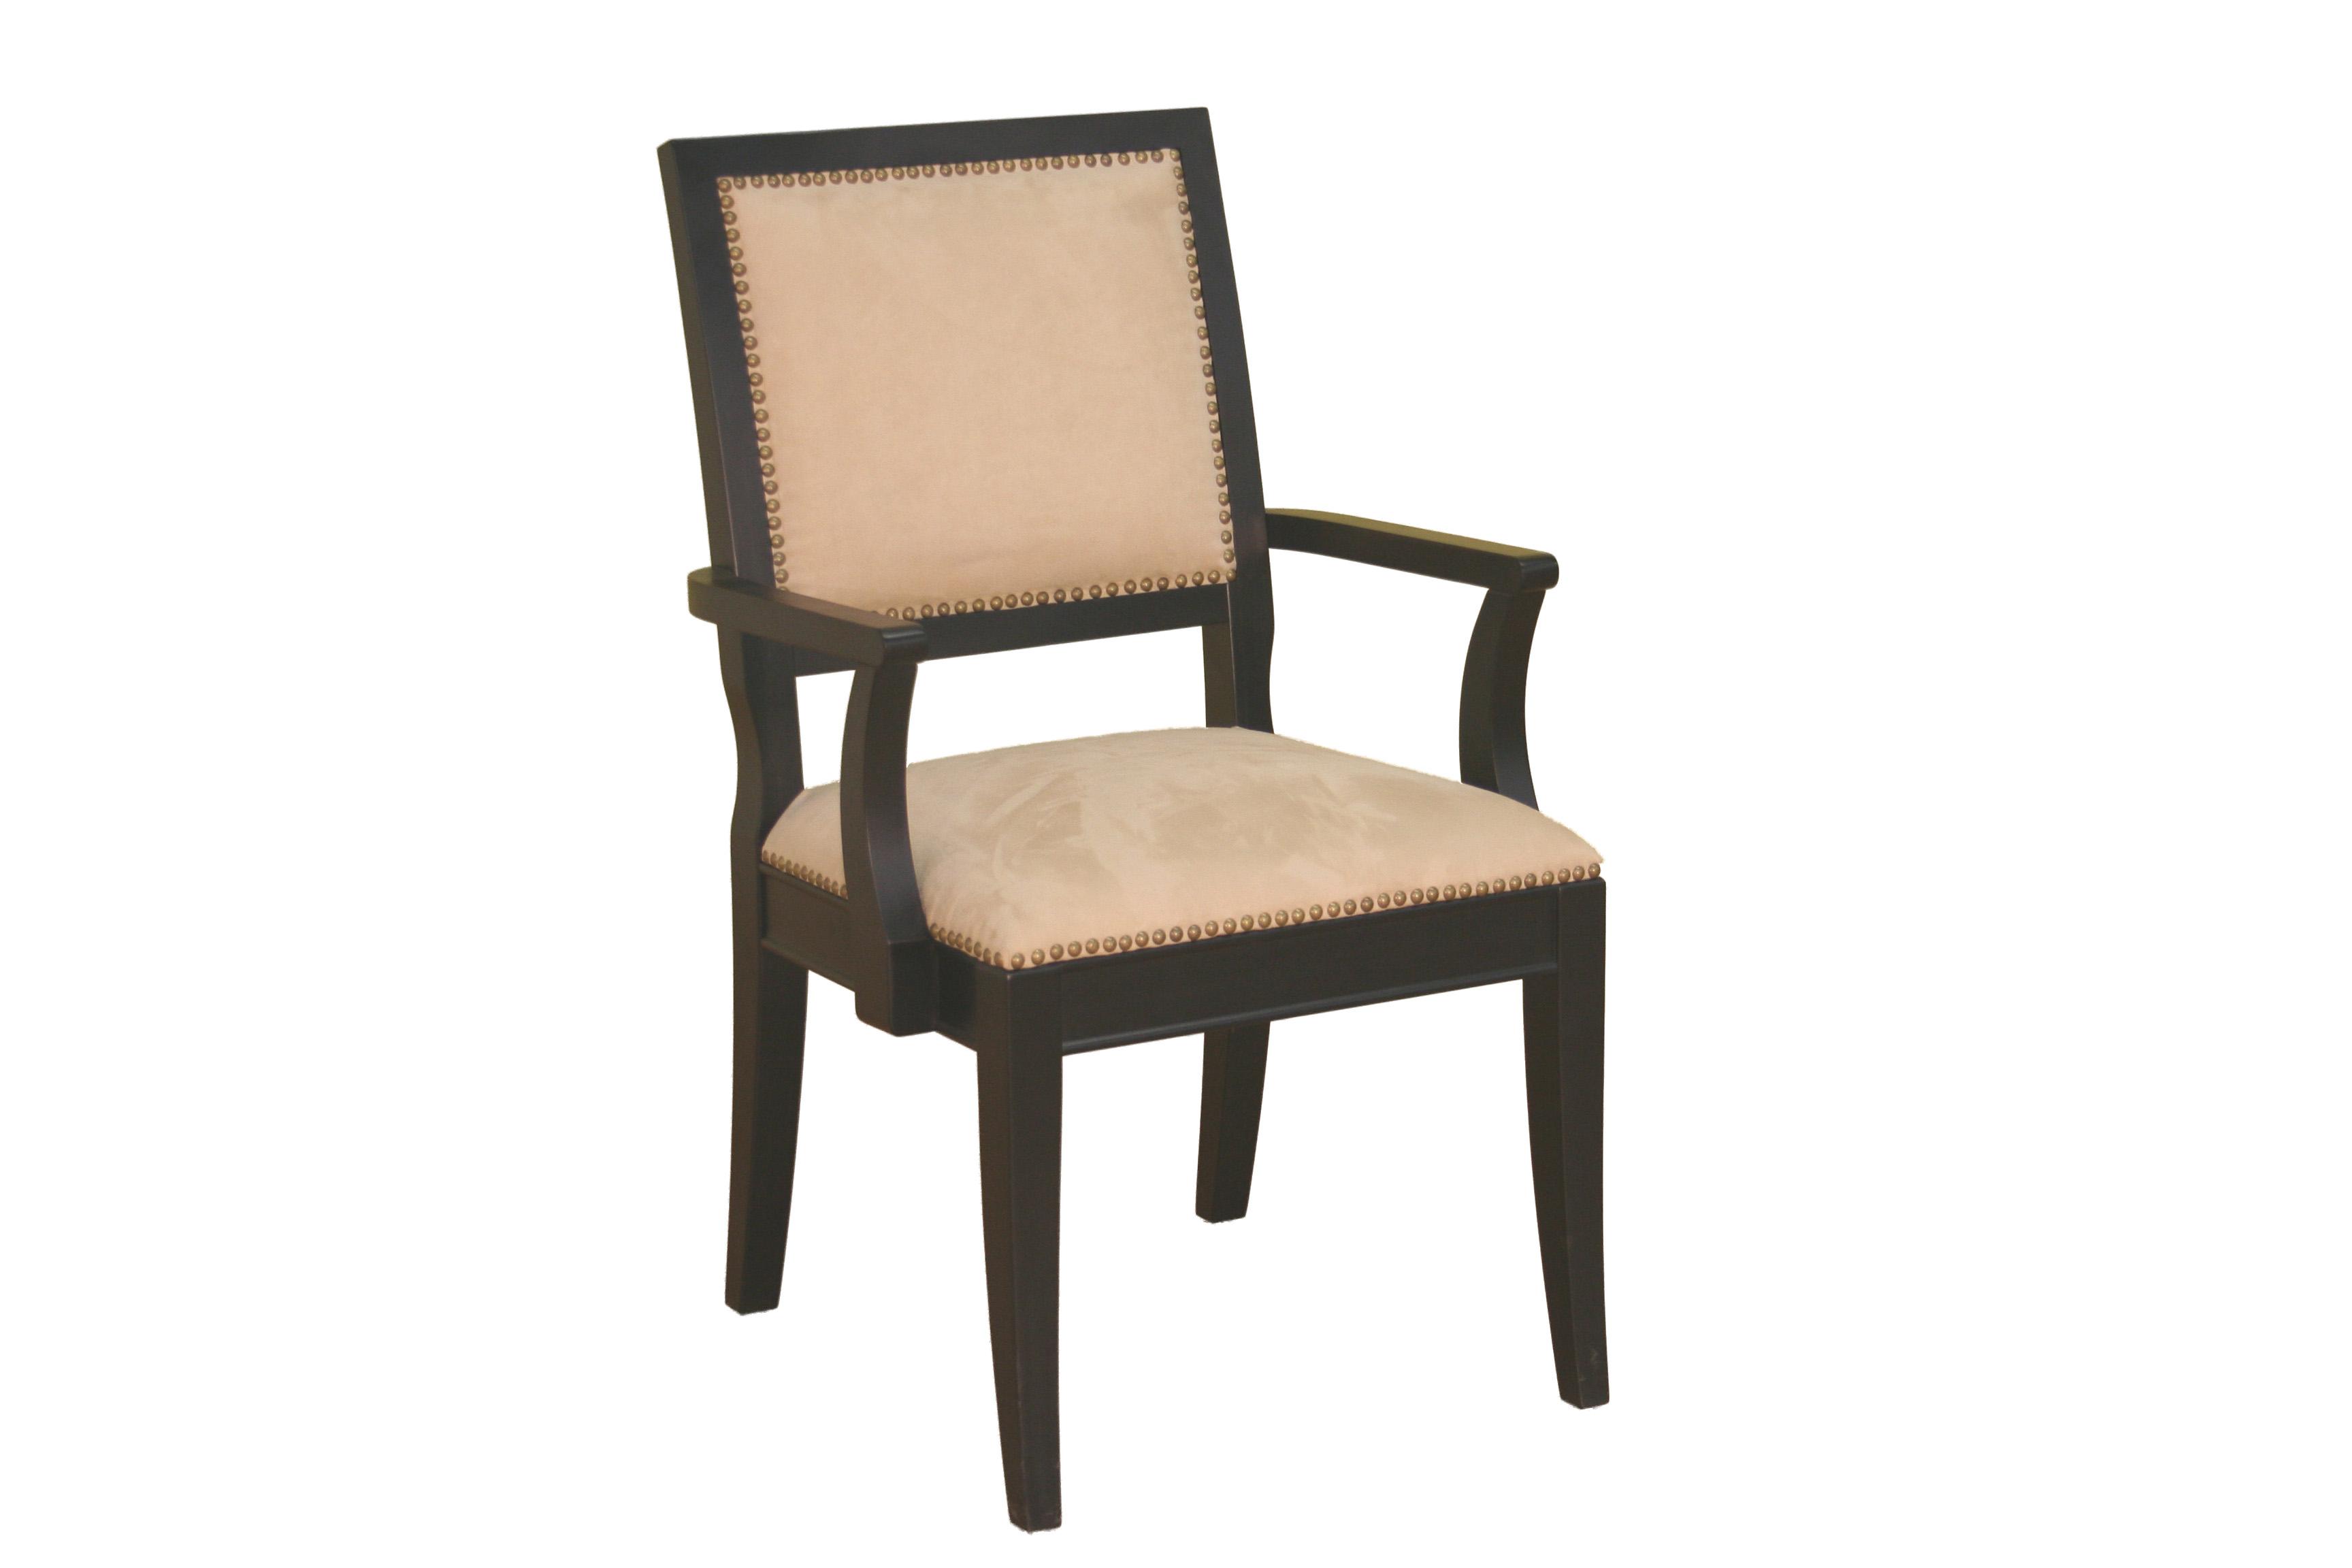 steam mop fabric sofa rattan corner homebase microfiber couchstratus recliner ~gramercy park ...